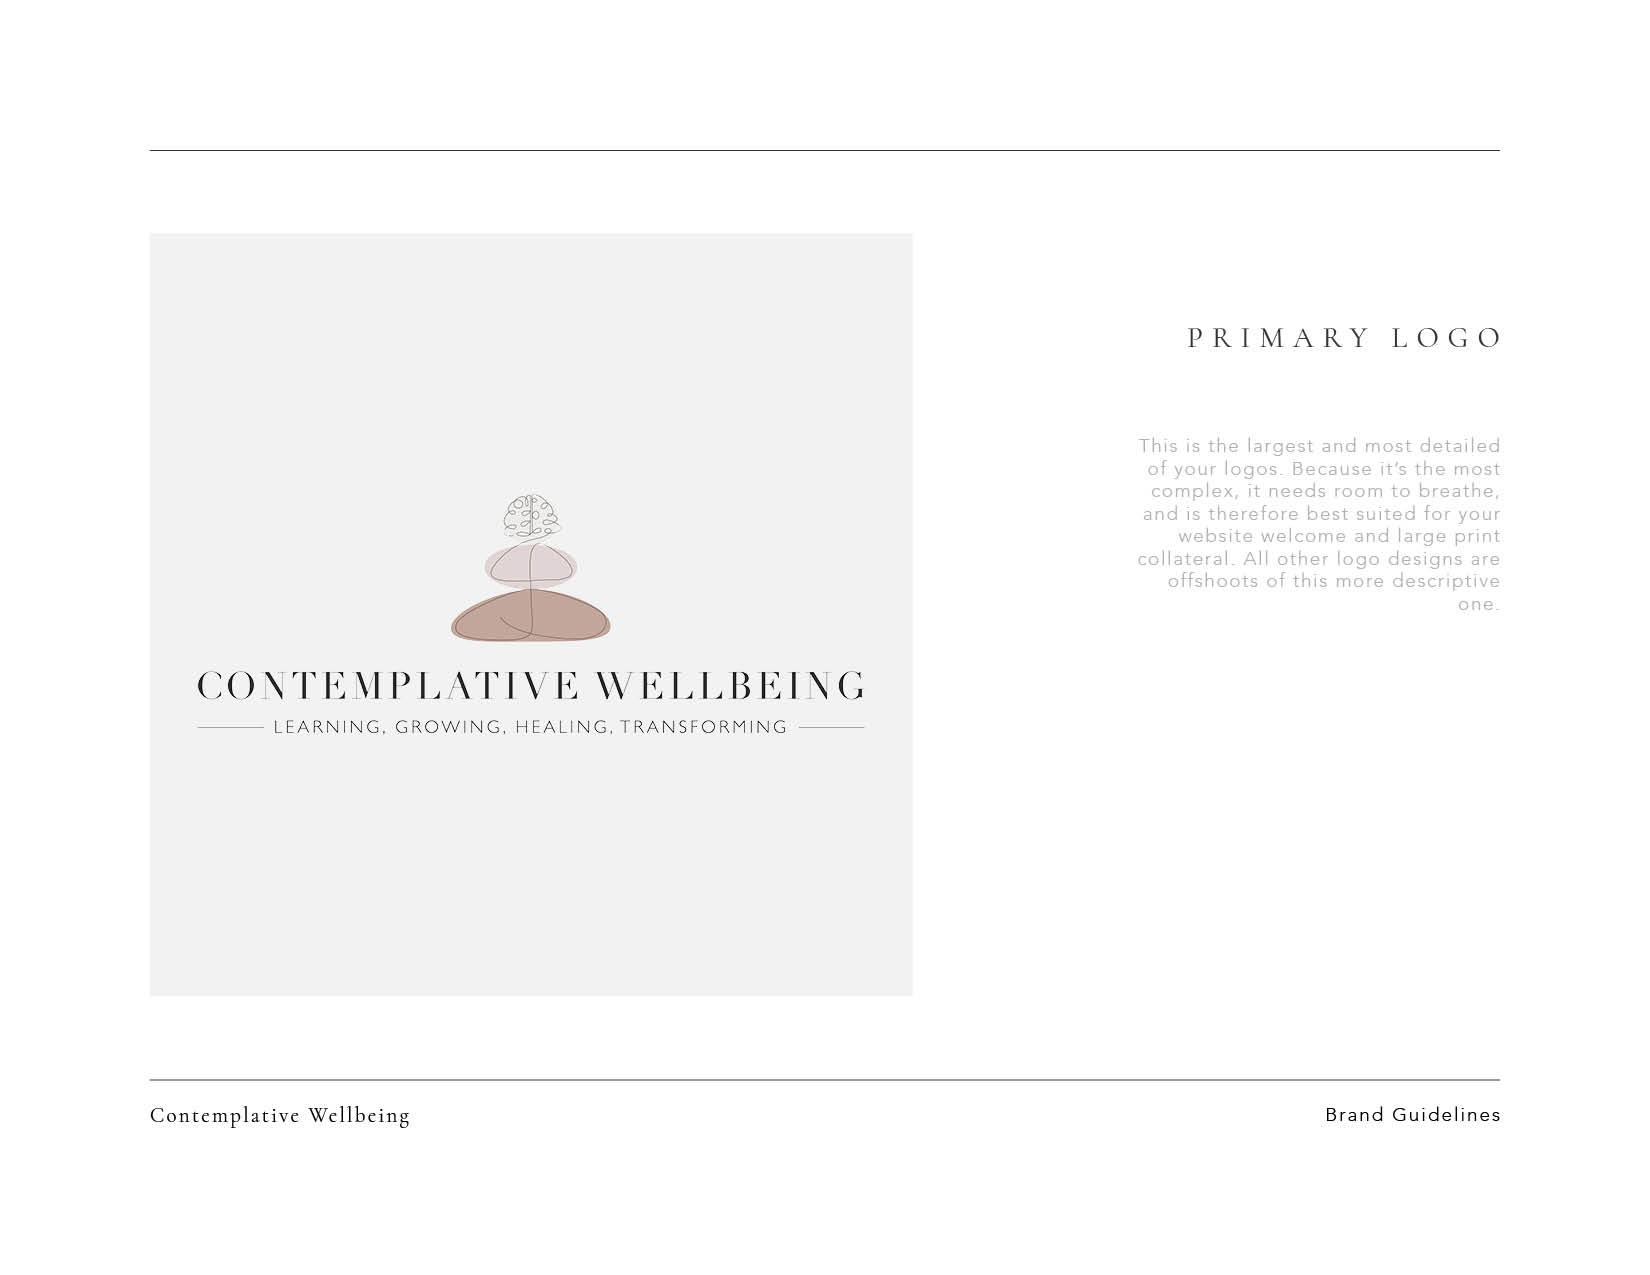 contemplative-wellbeing_brand-guidelines.jpg